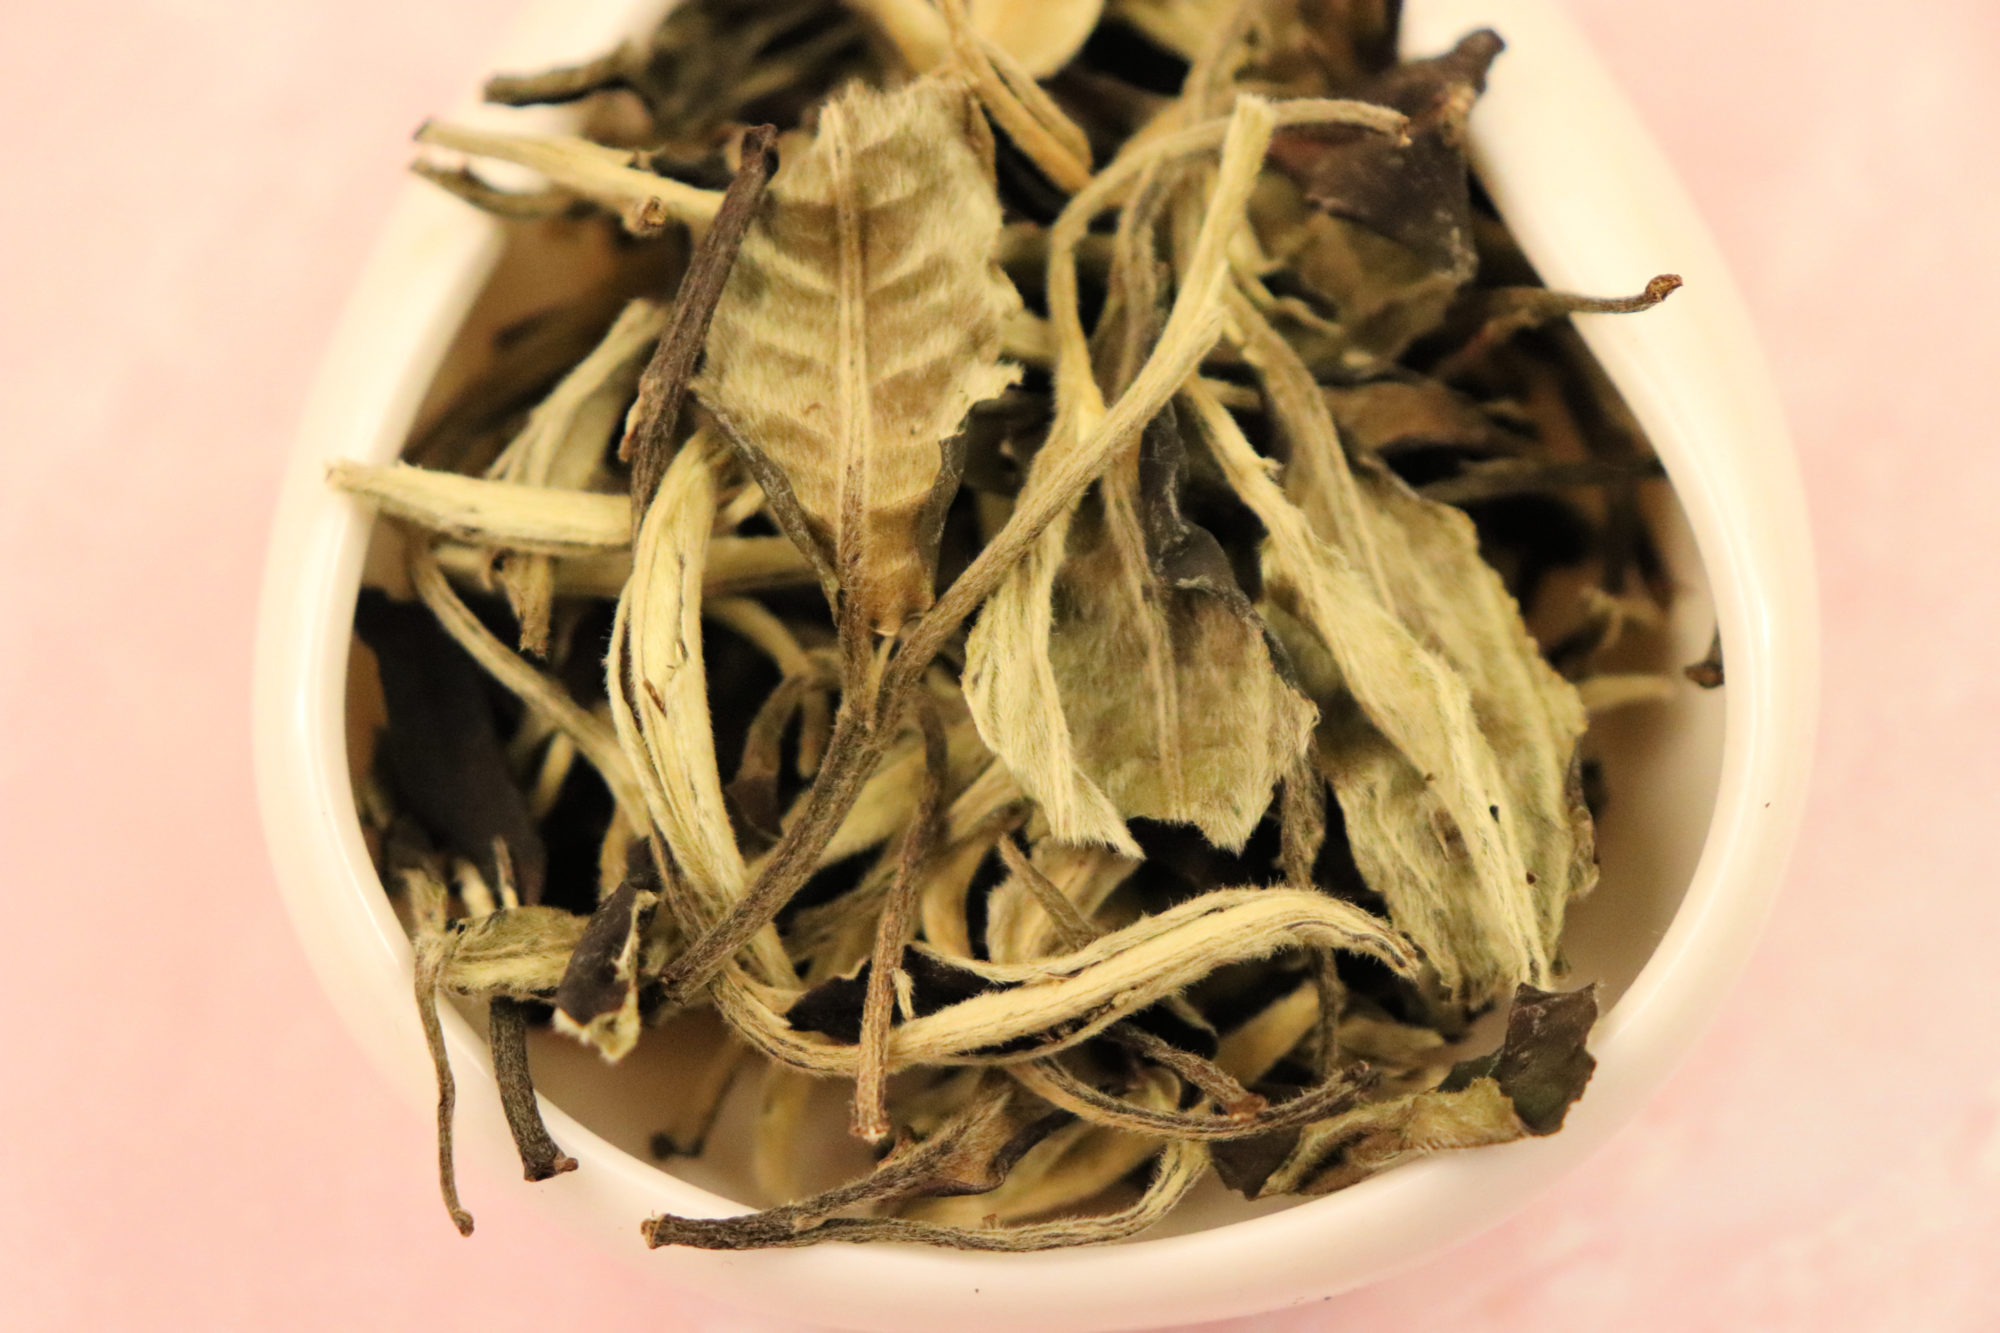 Yue Guang Bai - Moonlight White tea leaves